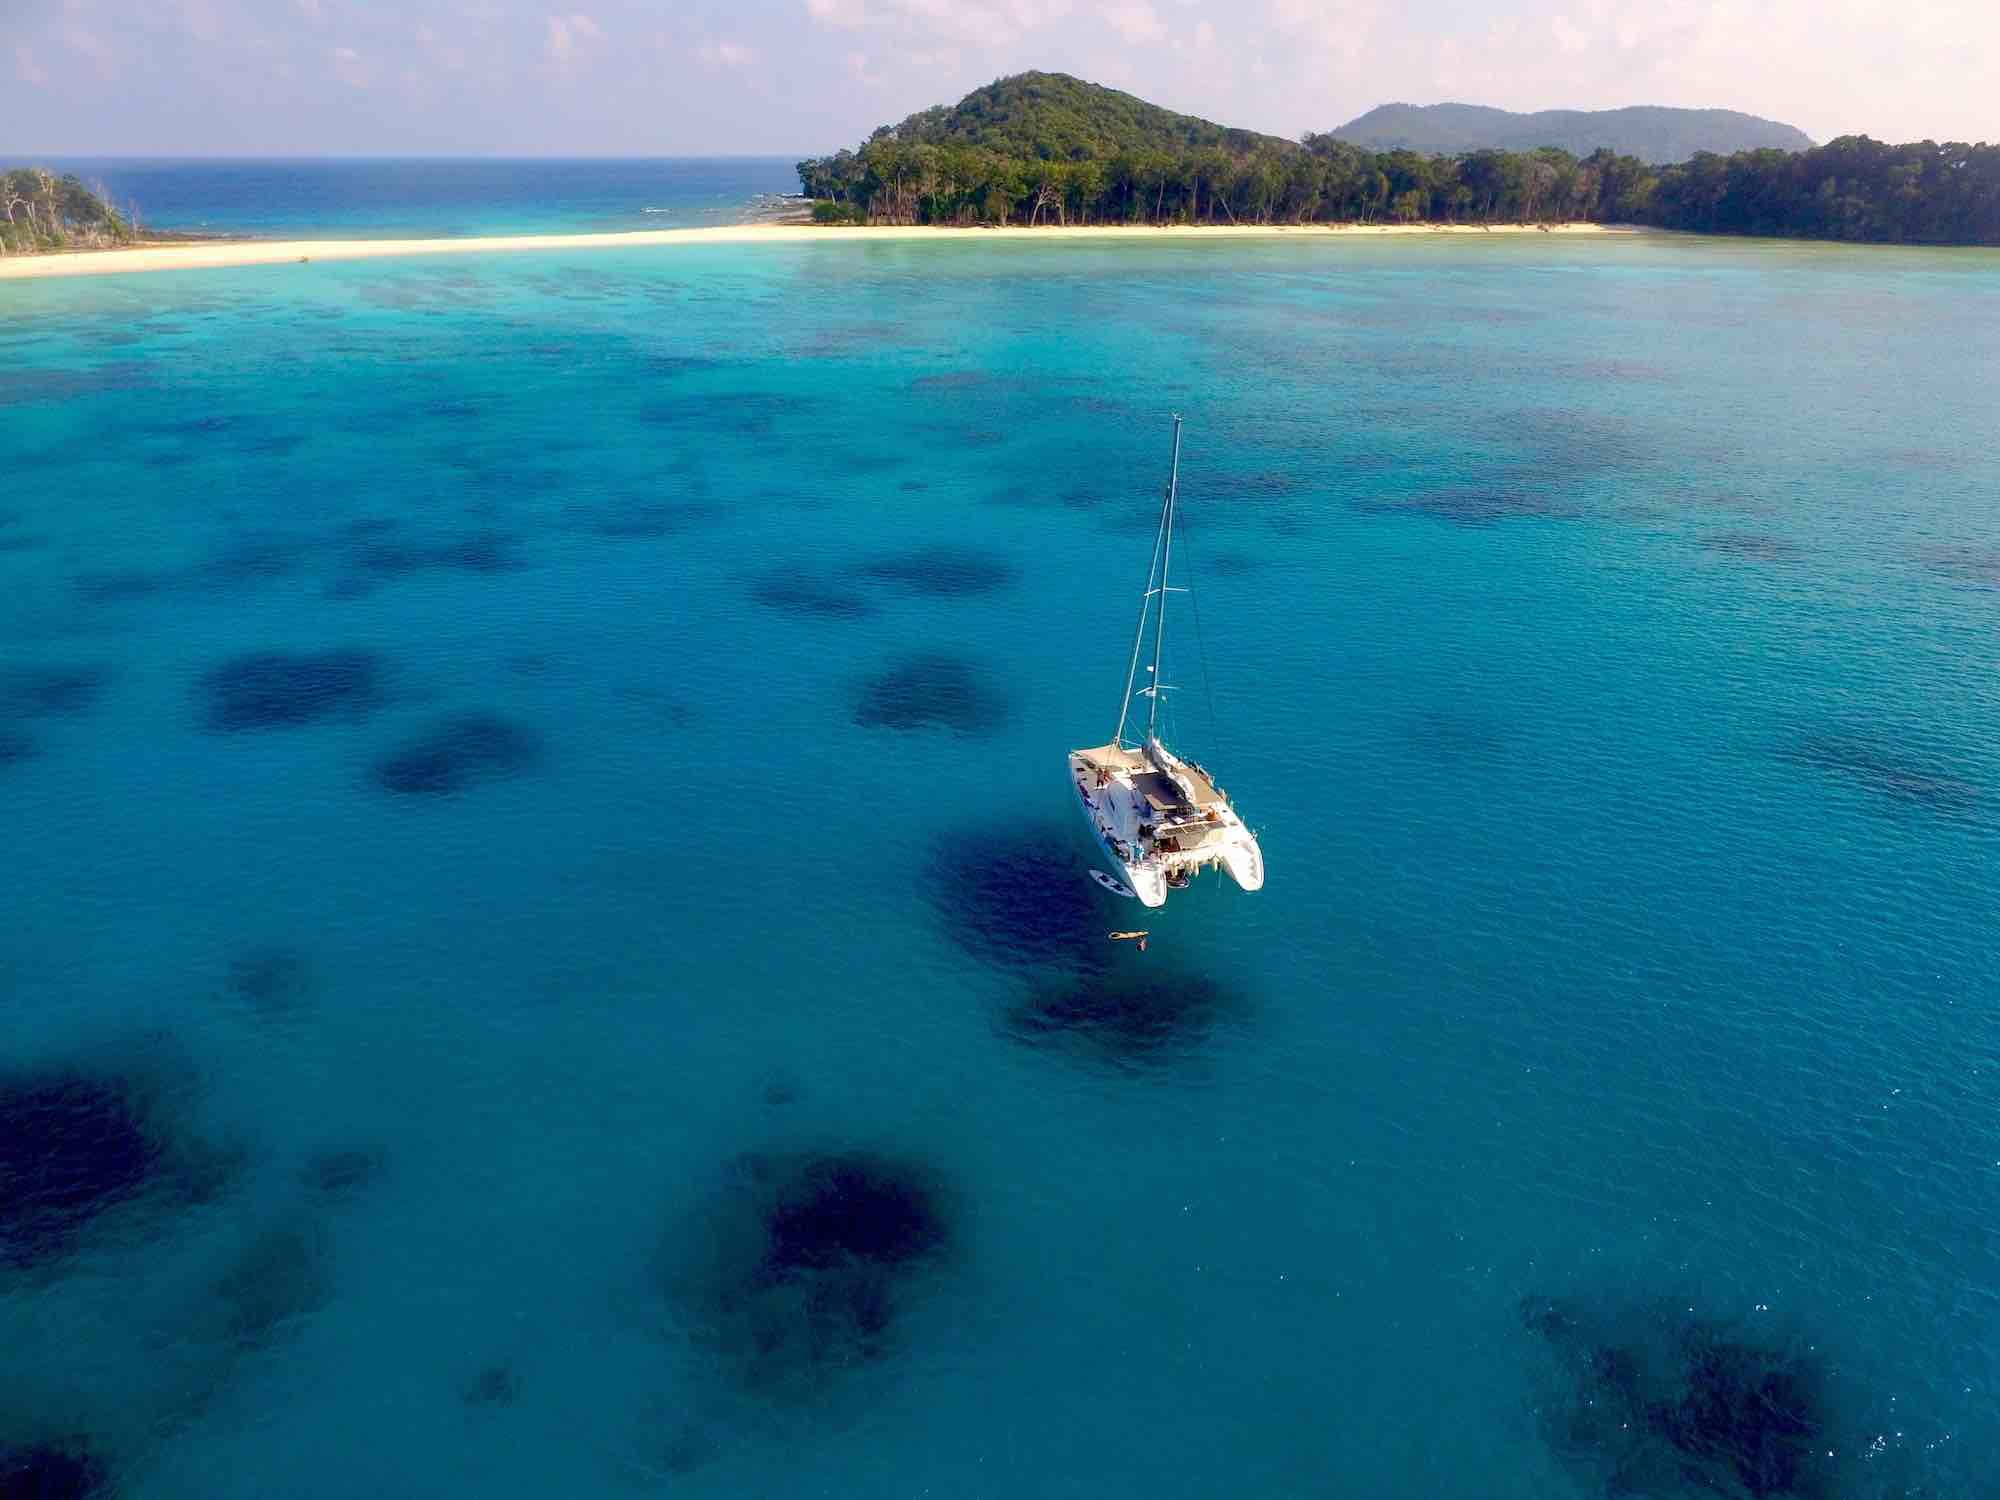 Andaman Islands_drone photo of blue waters lush island and charter yacht_XS.jpeg